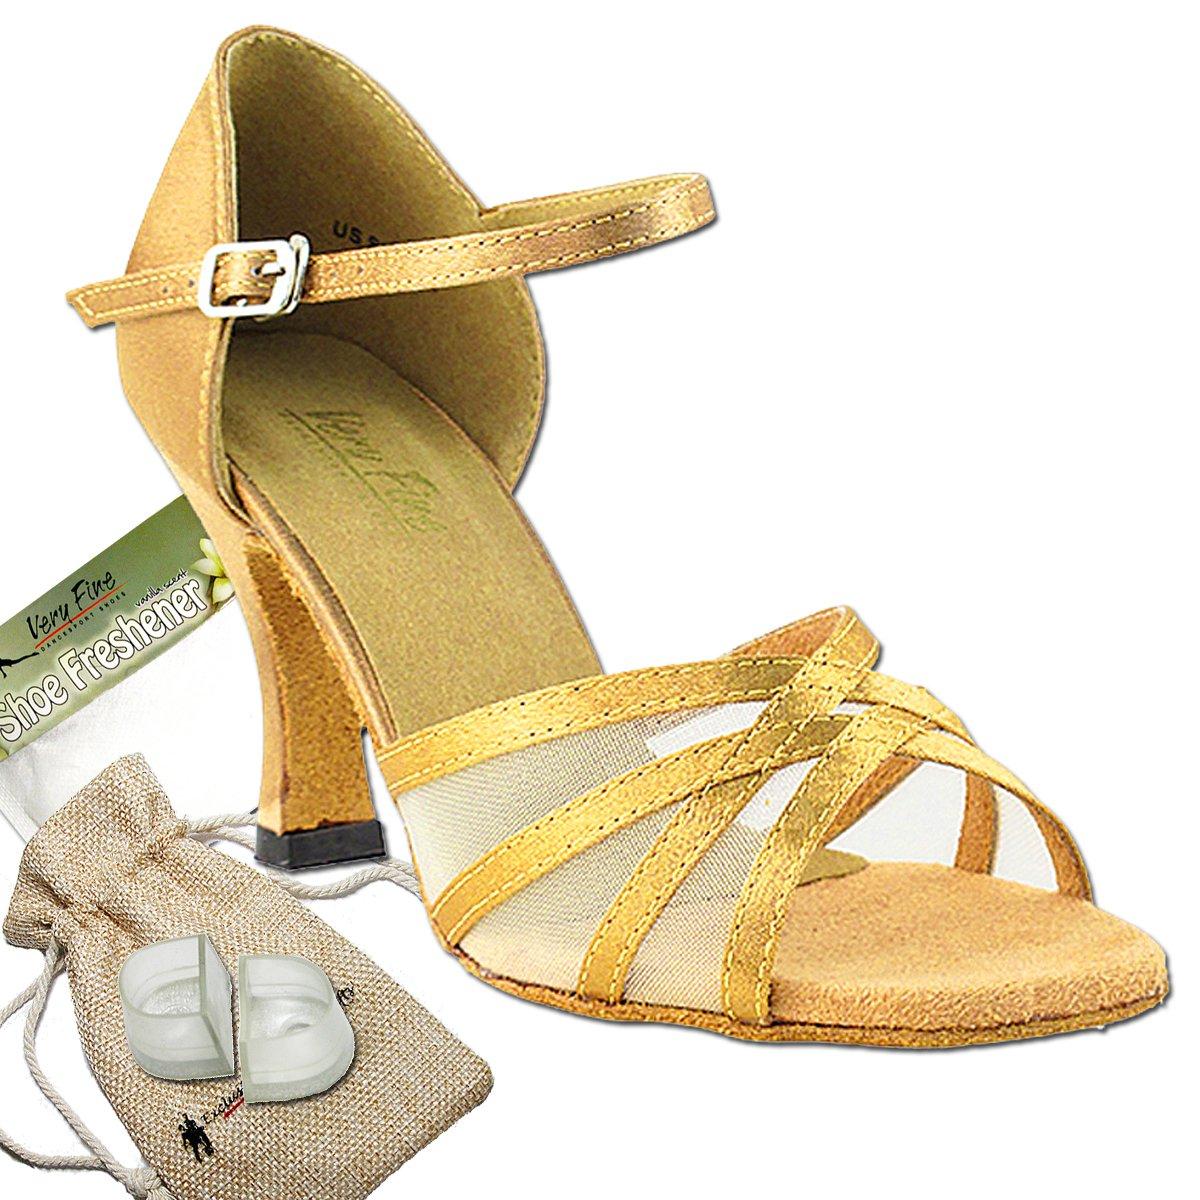 Women's Ballroom Dance Shoes Tango Wedding Salsa Dance Shoes Brown Satin & Flesh Mesh 6027EB Comfortable - Very Fine 2.5'' Heel 7.5 M US [Bundle of 5]